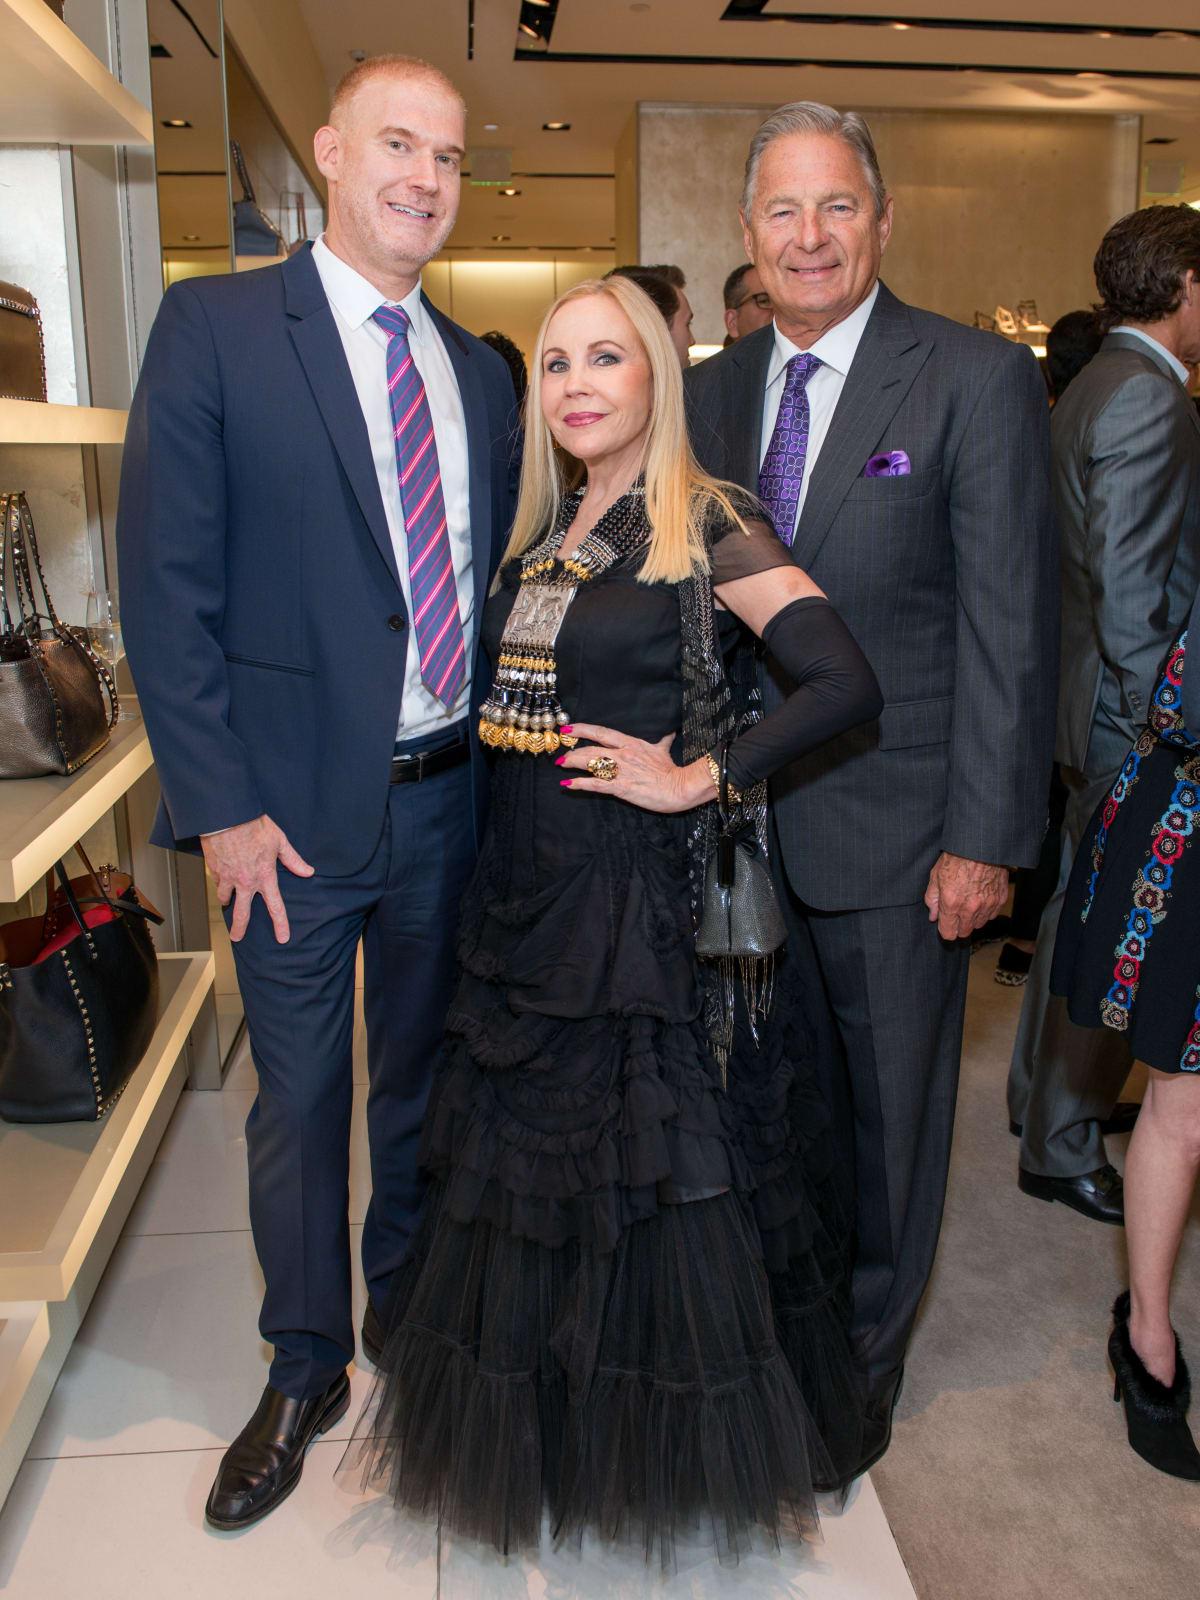 News, Shelby, Heart of Fashion, Valentino, Sept. 2015, Gary Soloff, Carolyn Farb, Charles Ward